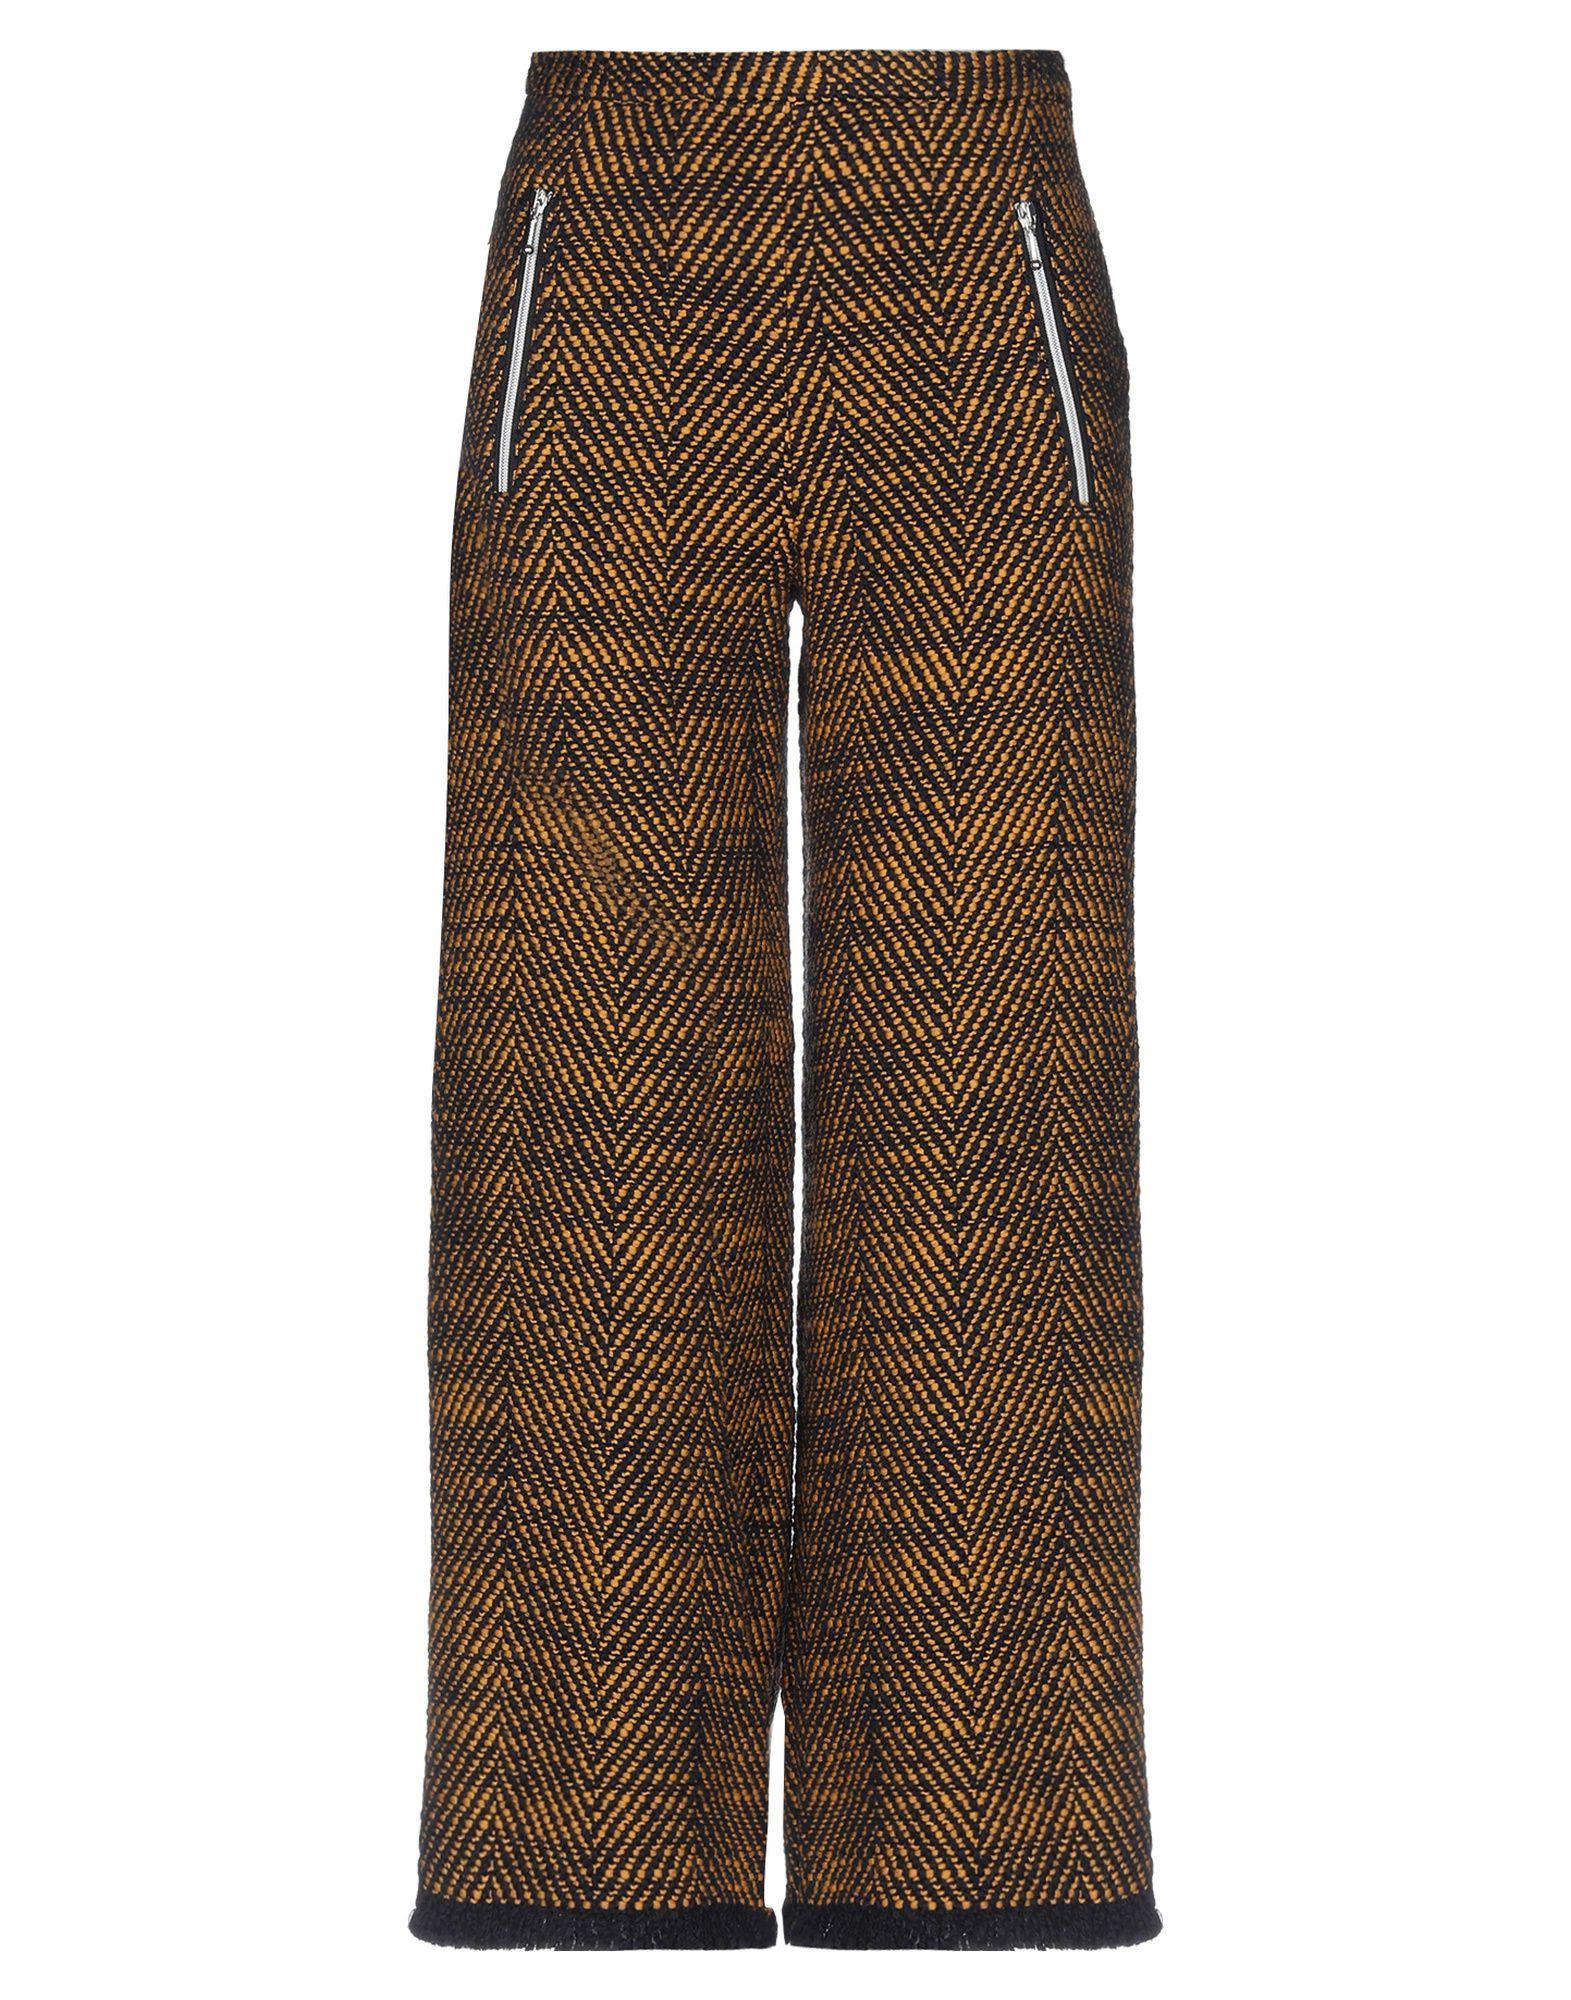 Pantalone Giovanna Nicolai damen - 13316826GC